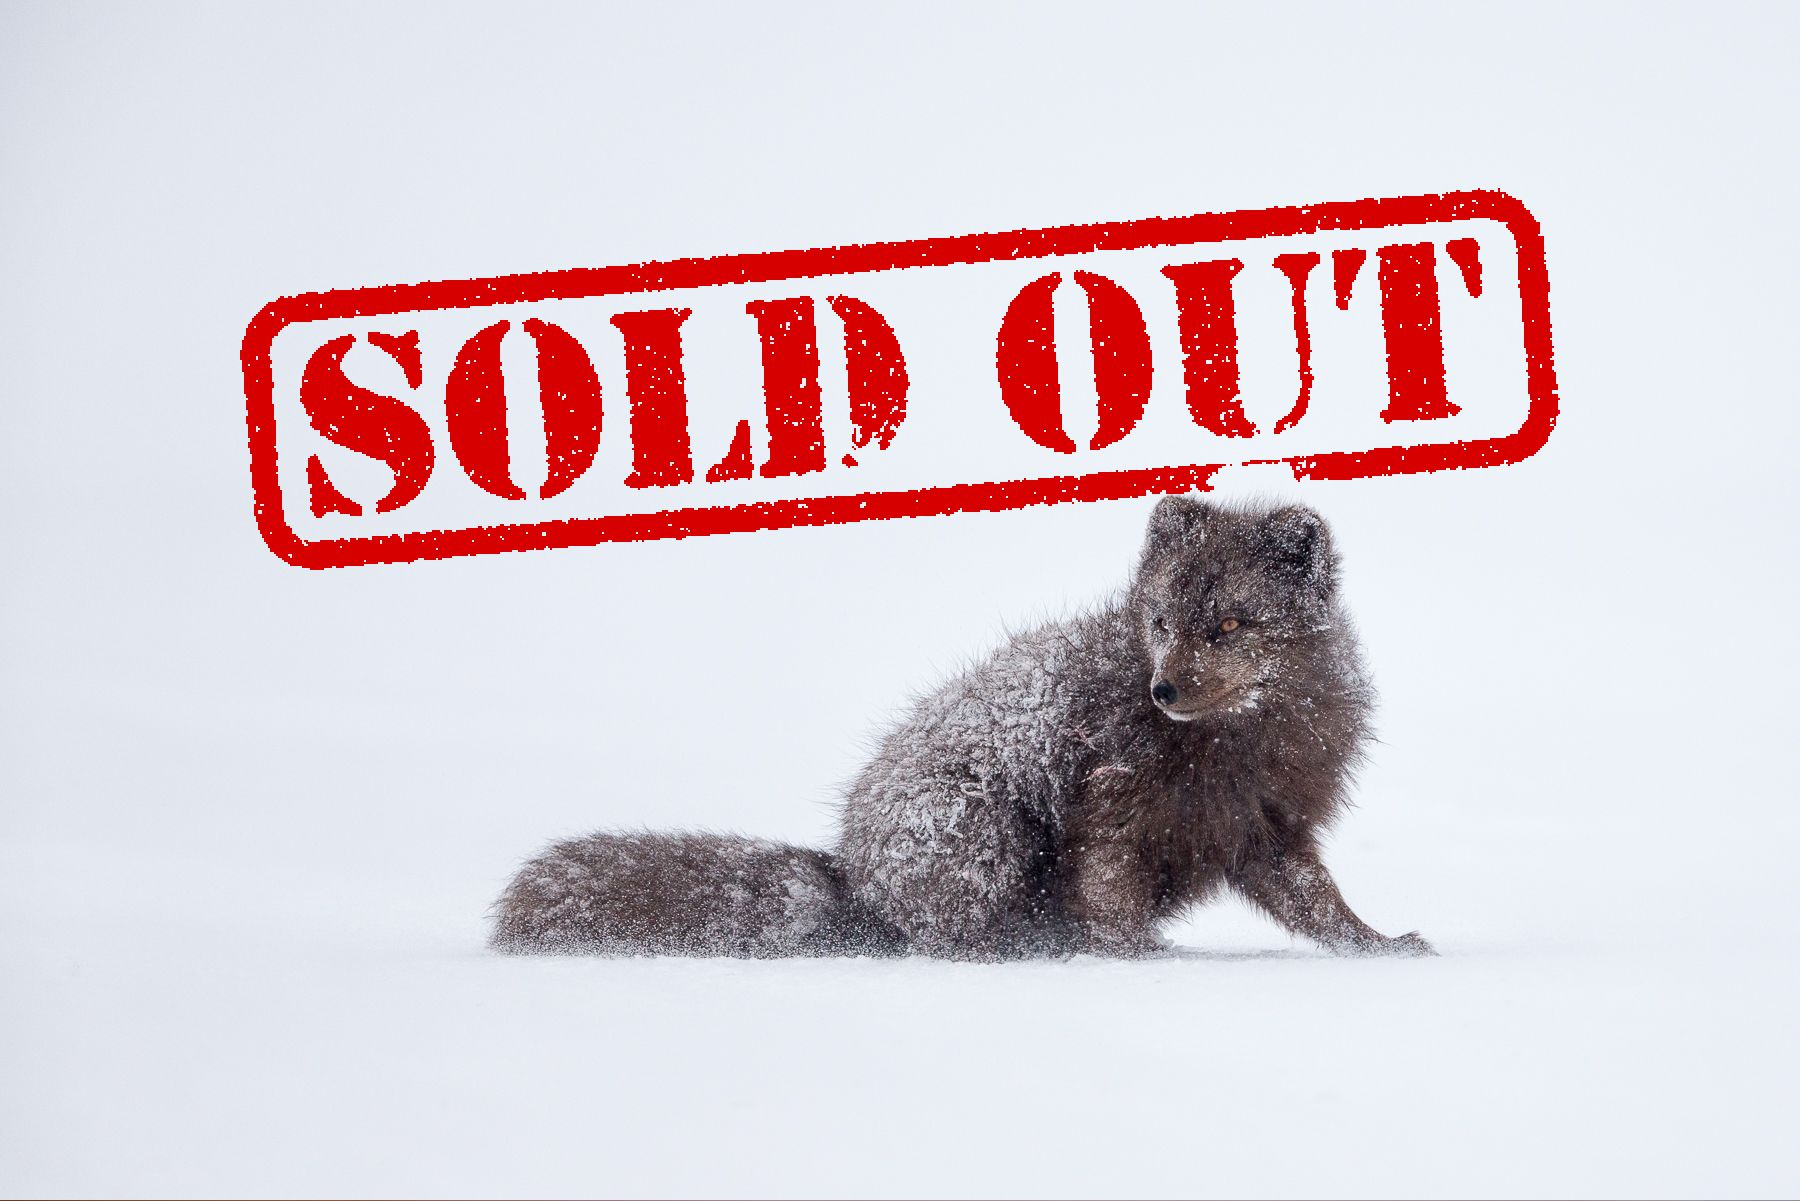 Arctic Fox Expedition 2019